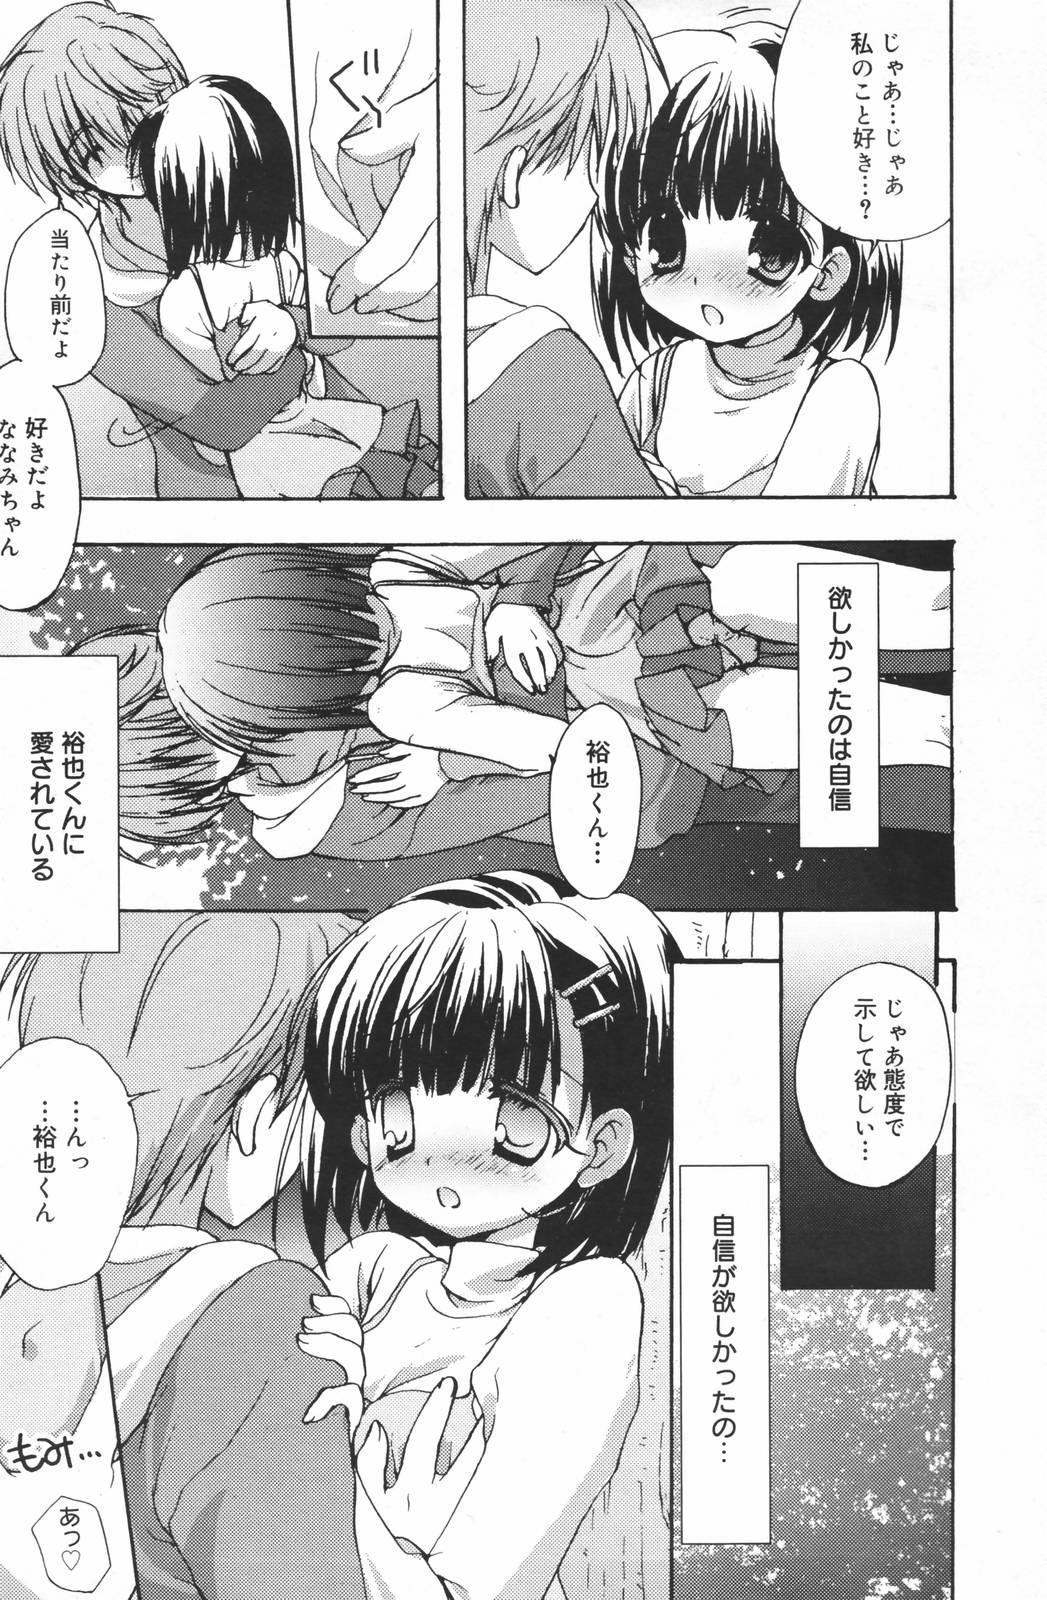 Manga Bangaichi 2007-03 84